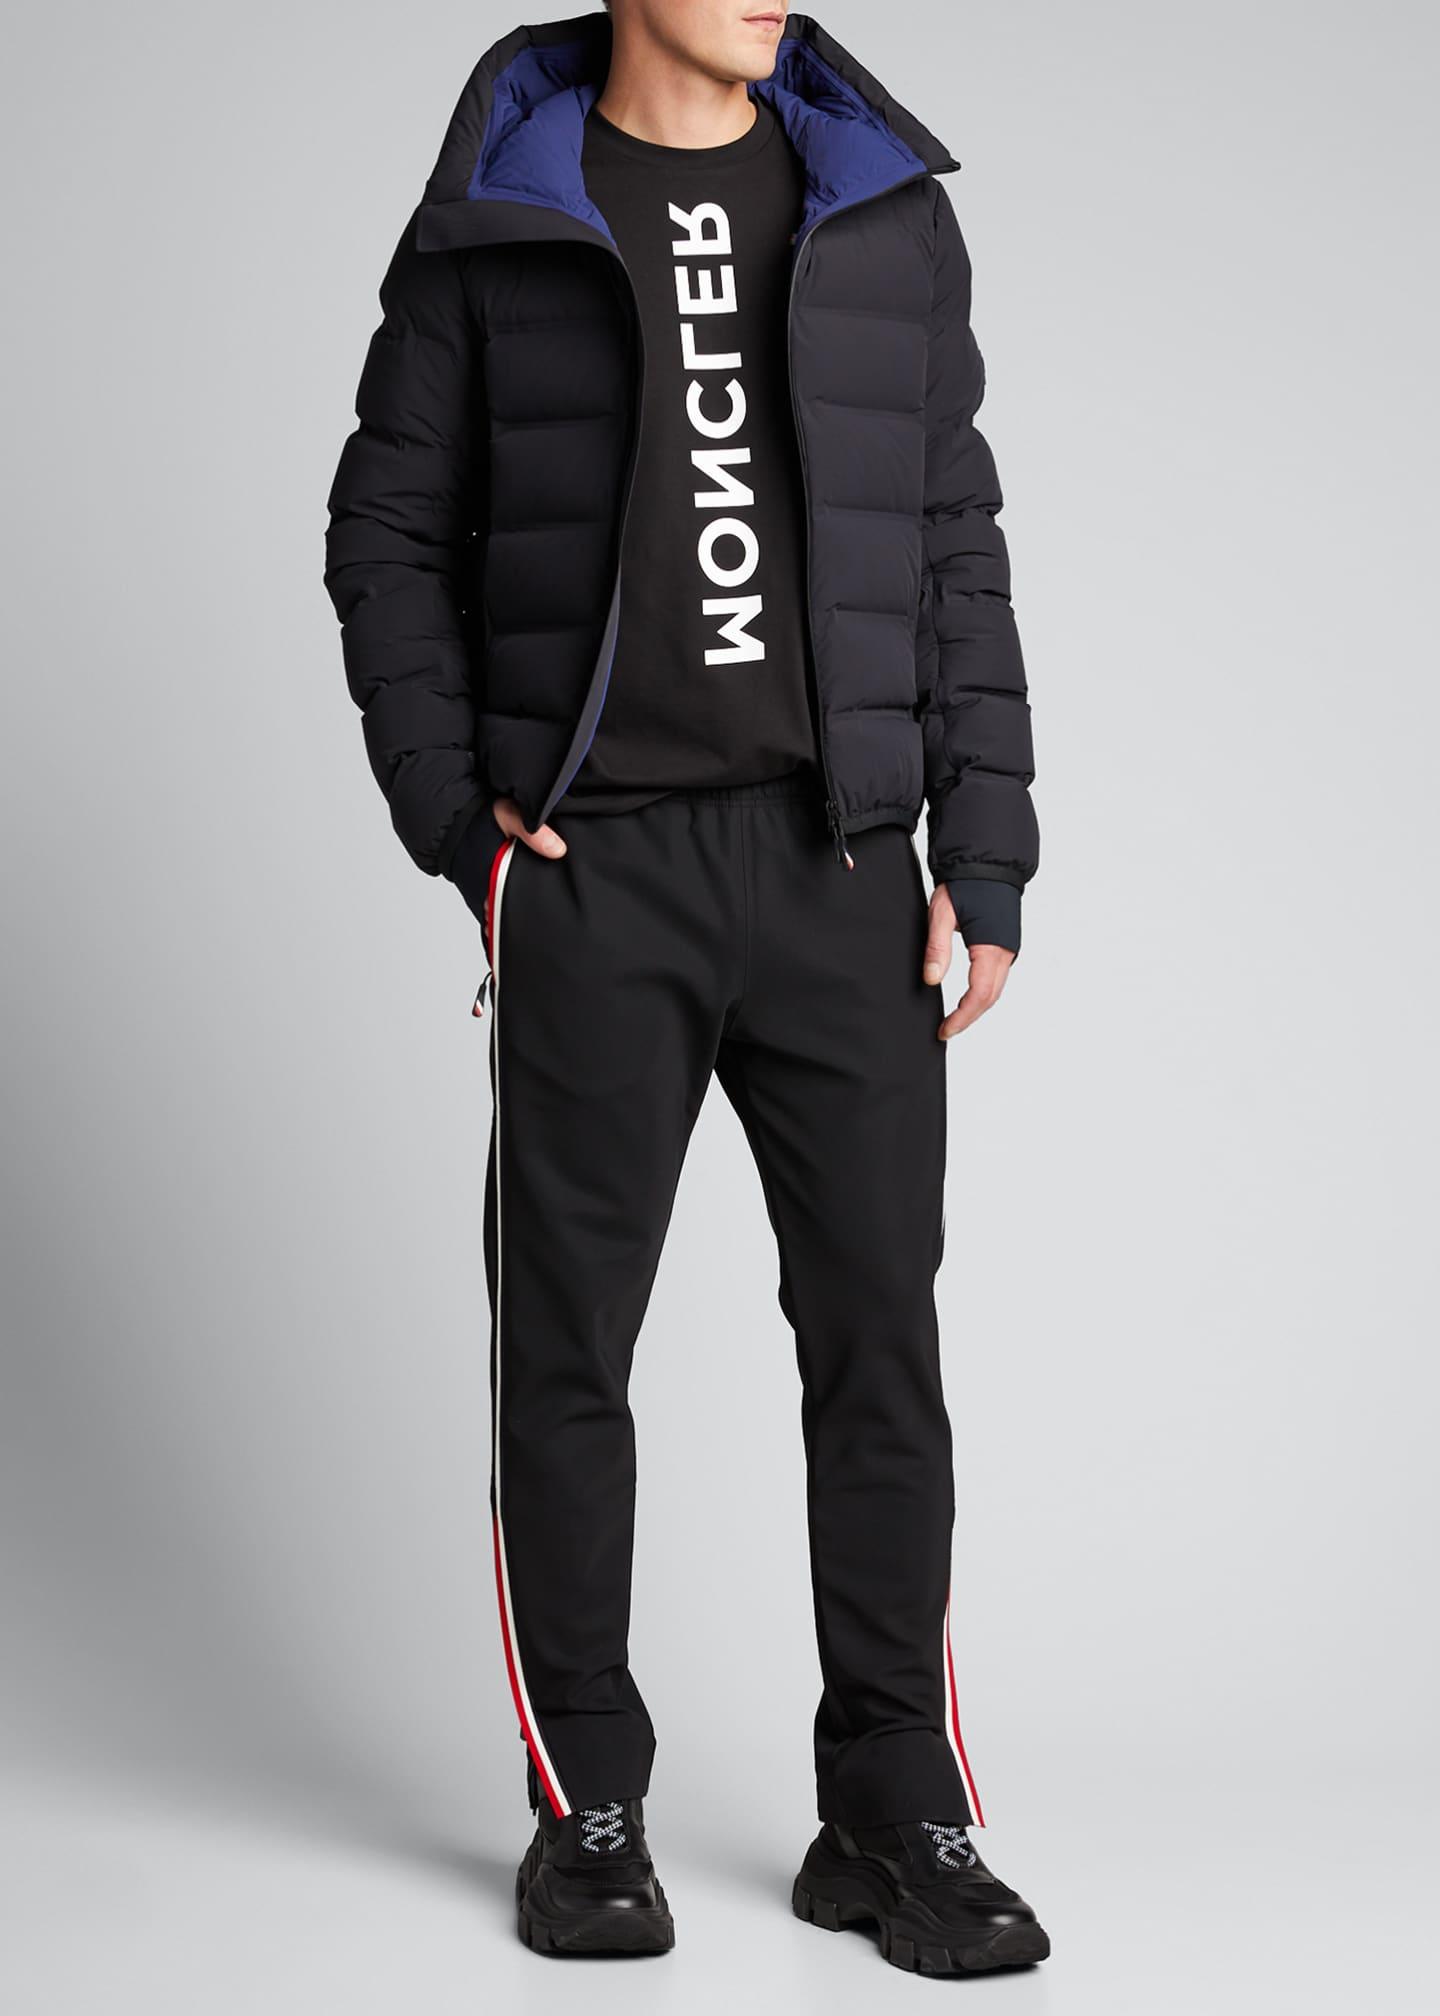 Moncler Men's Lagorai Hooded Puffer Jacket